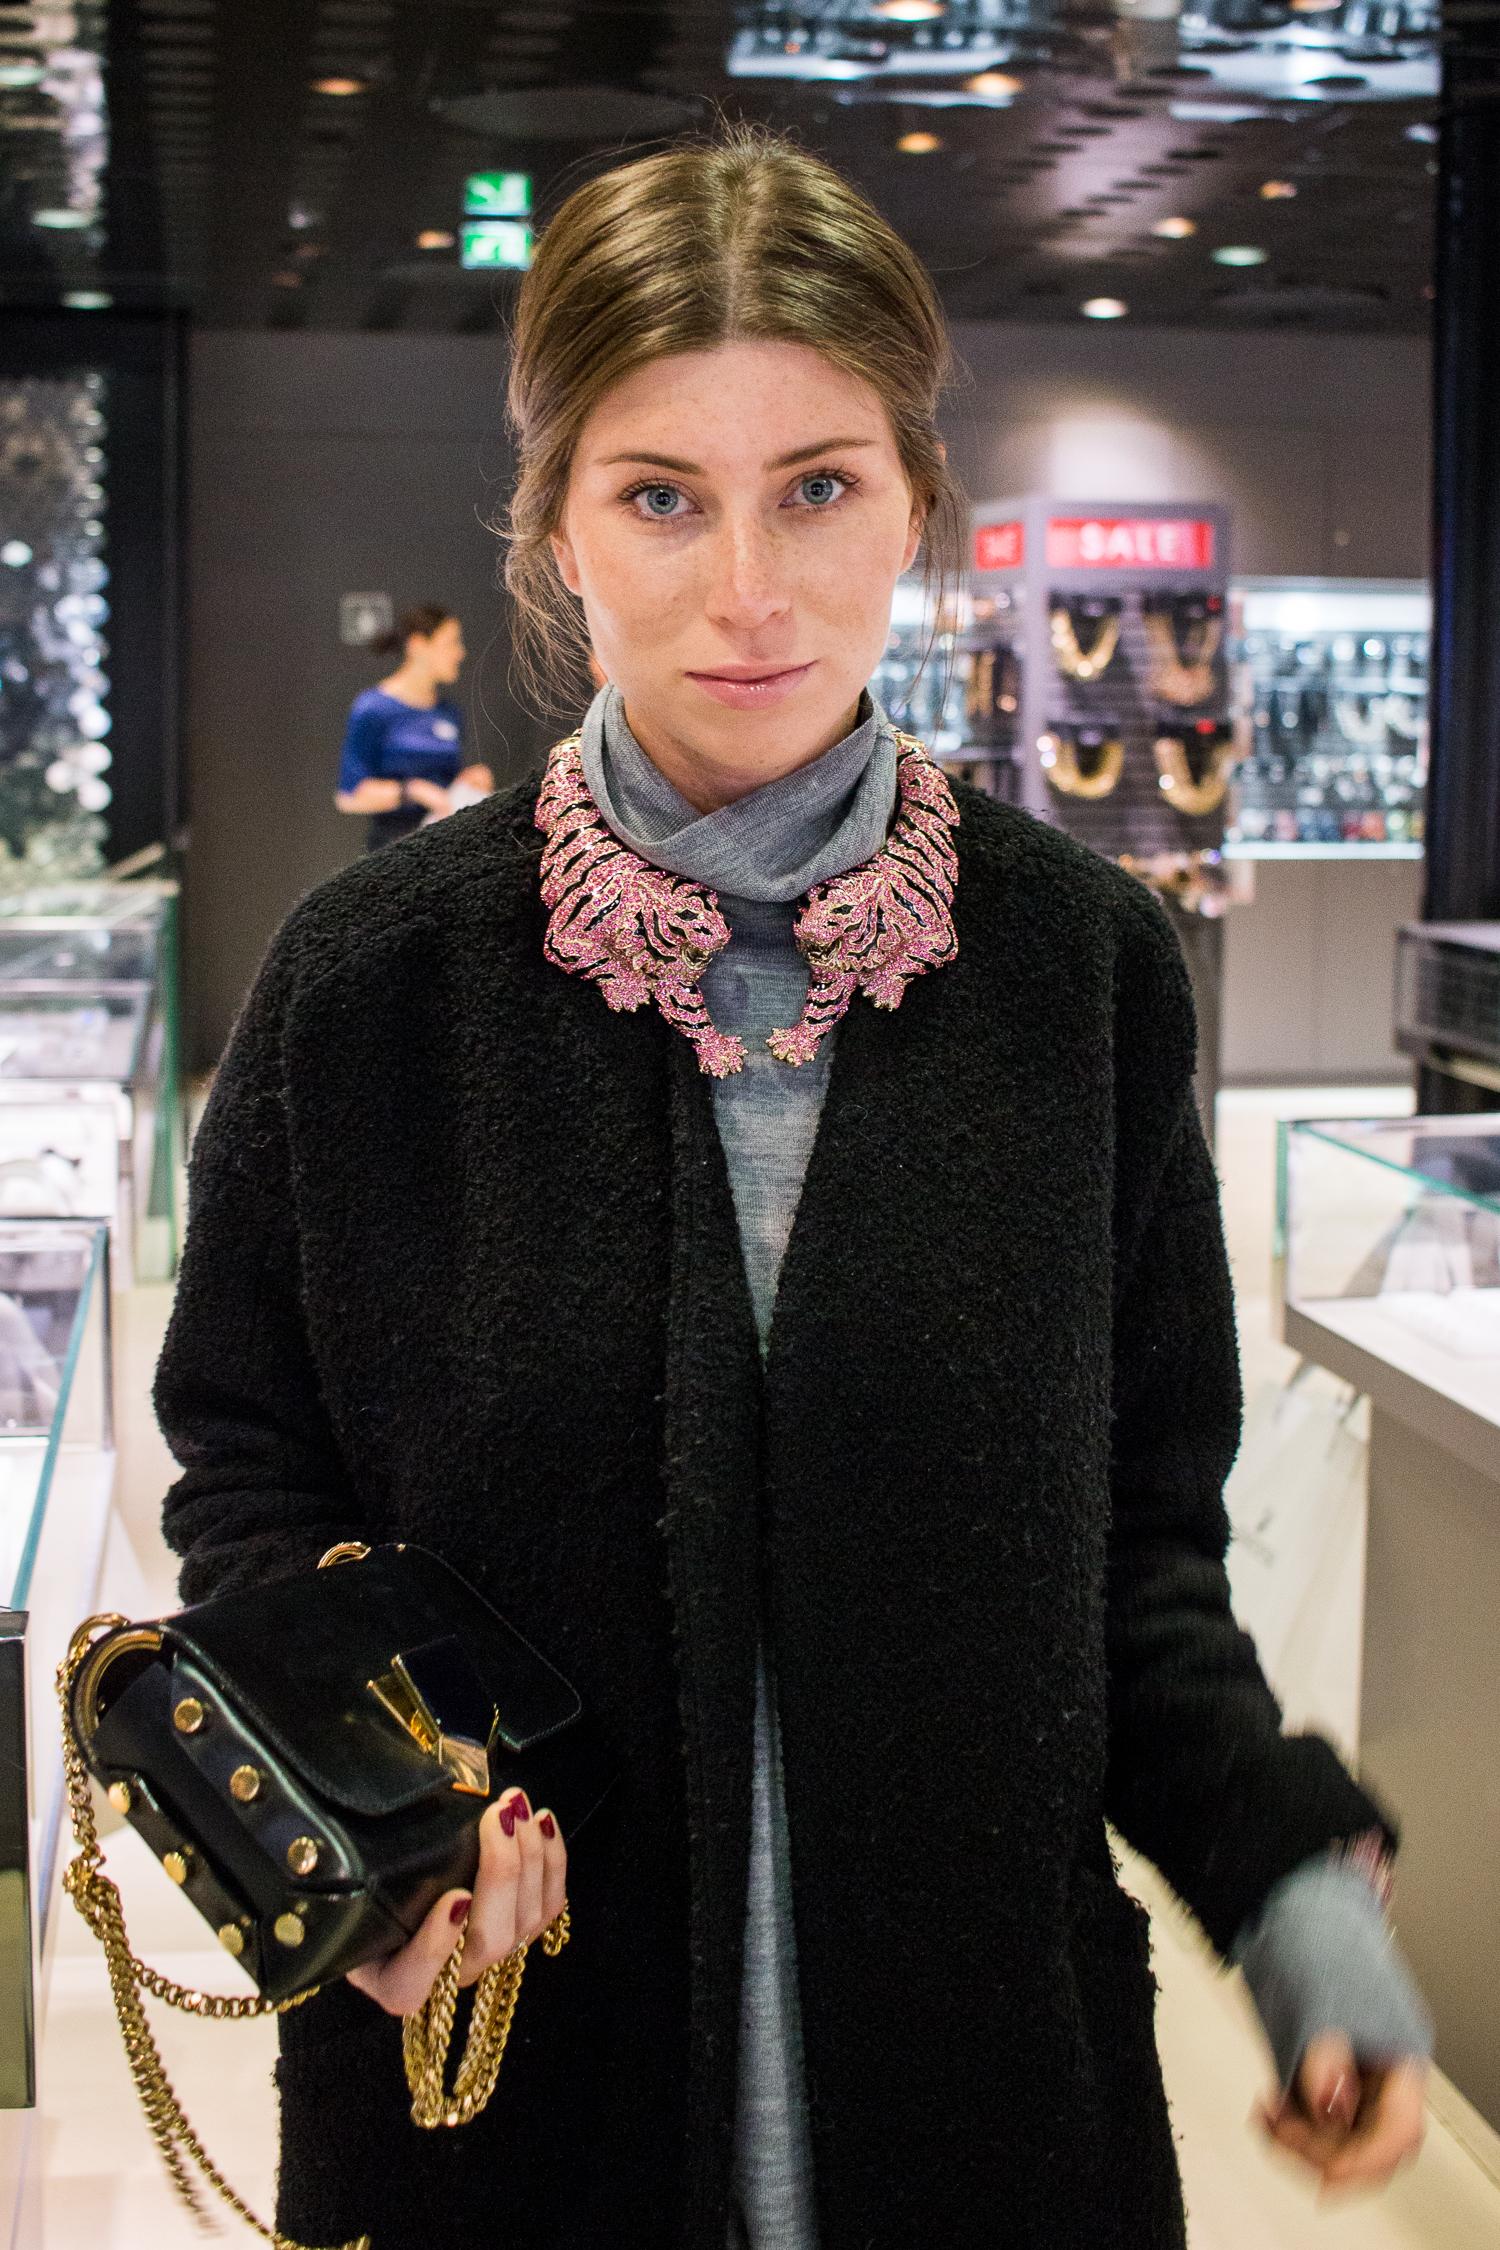 Swarovski Shopping Vienna | Love Daily Dose